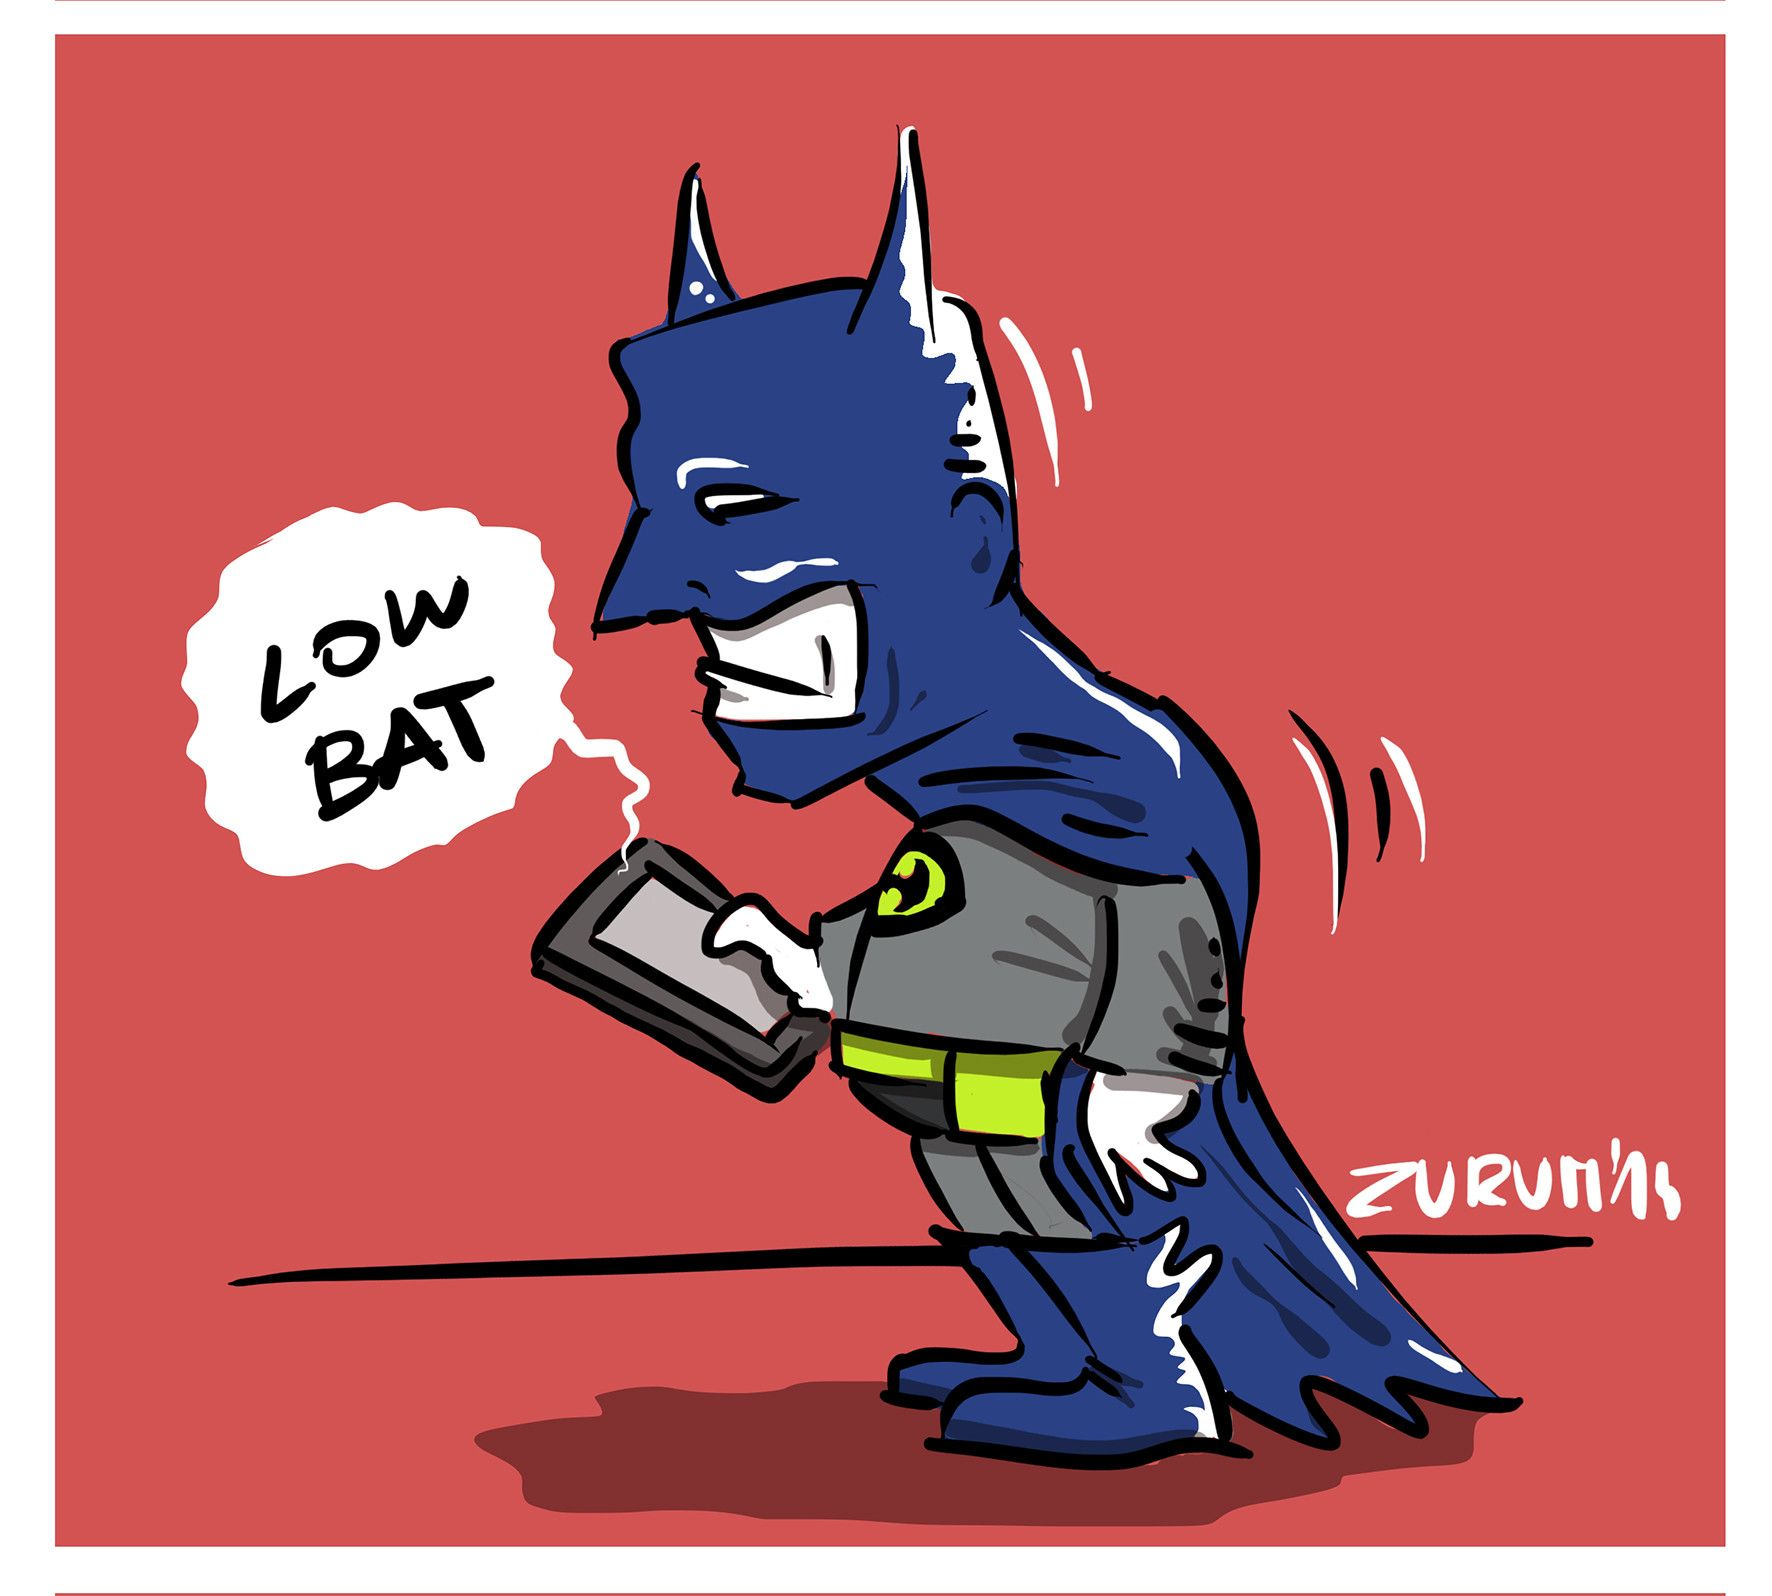 Low Bat....